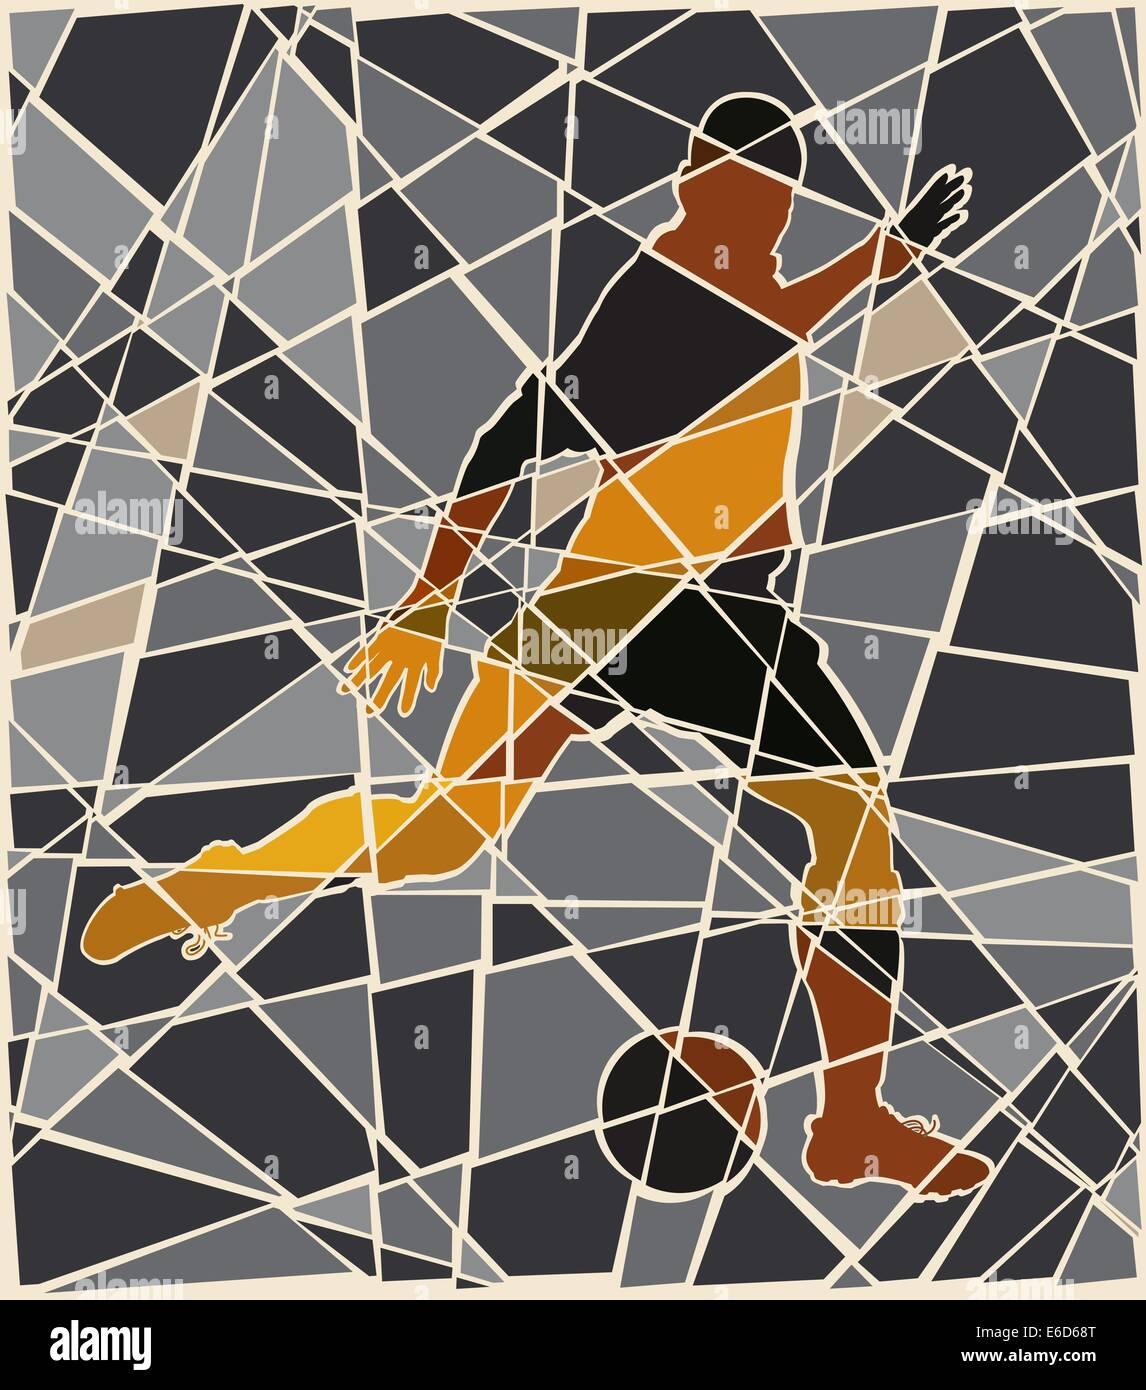 Editable vector mosaic illustration of a man kicking a football - Stock Vector